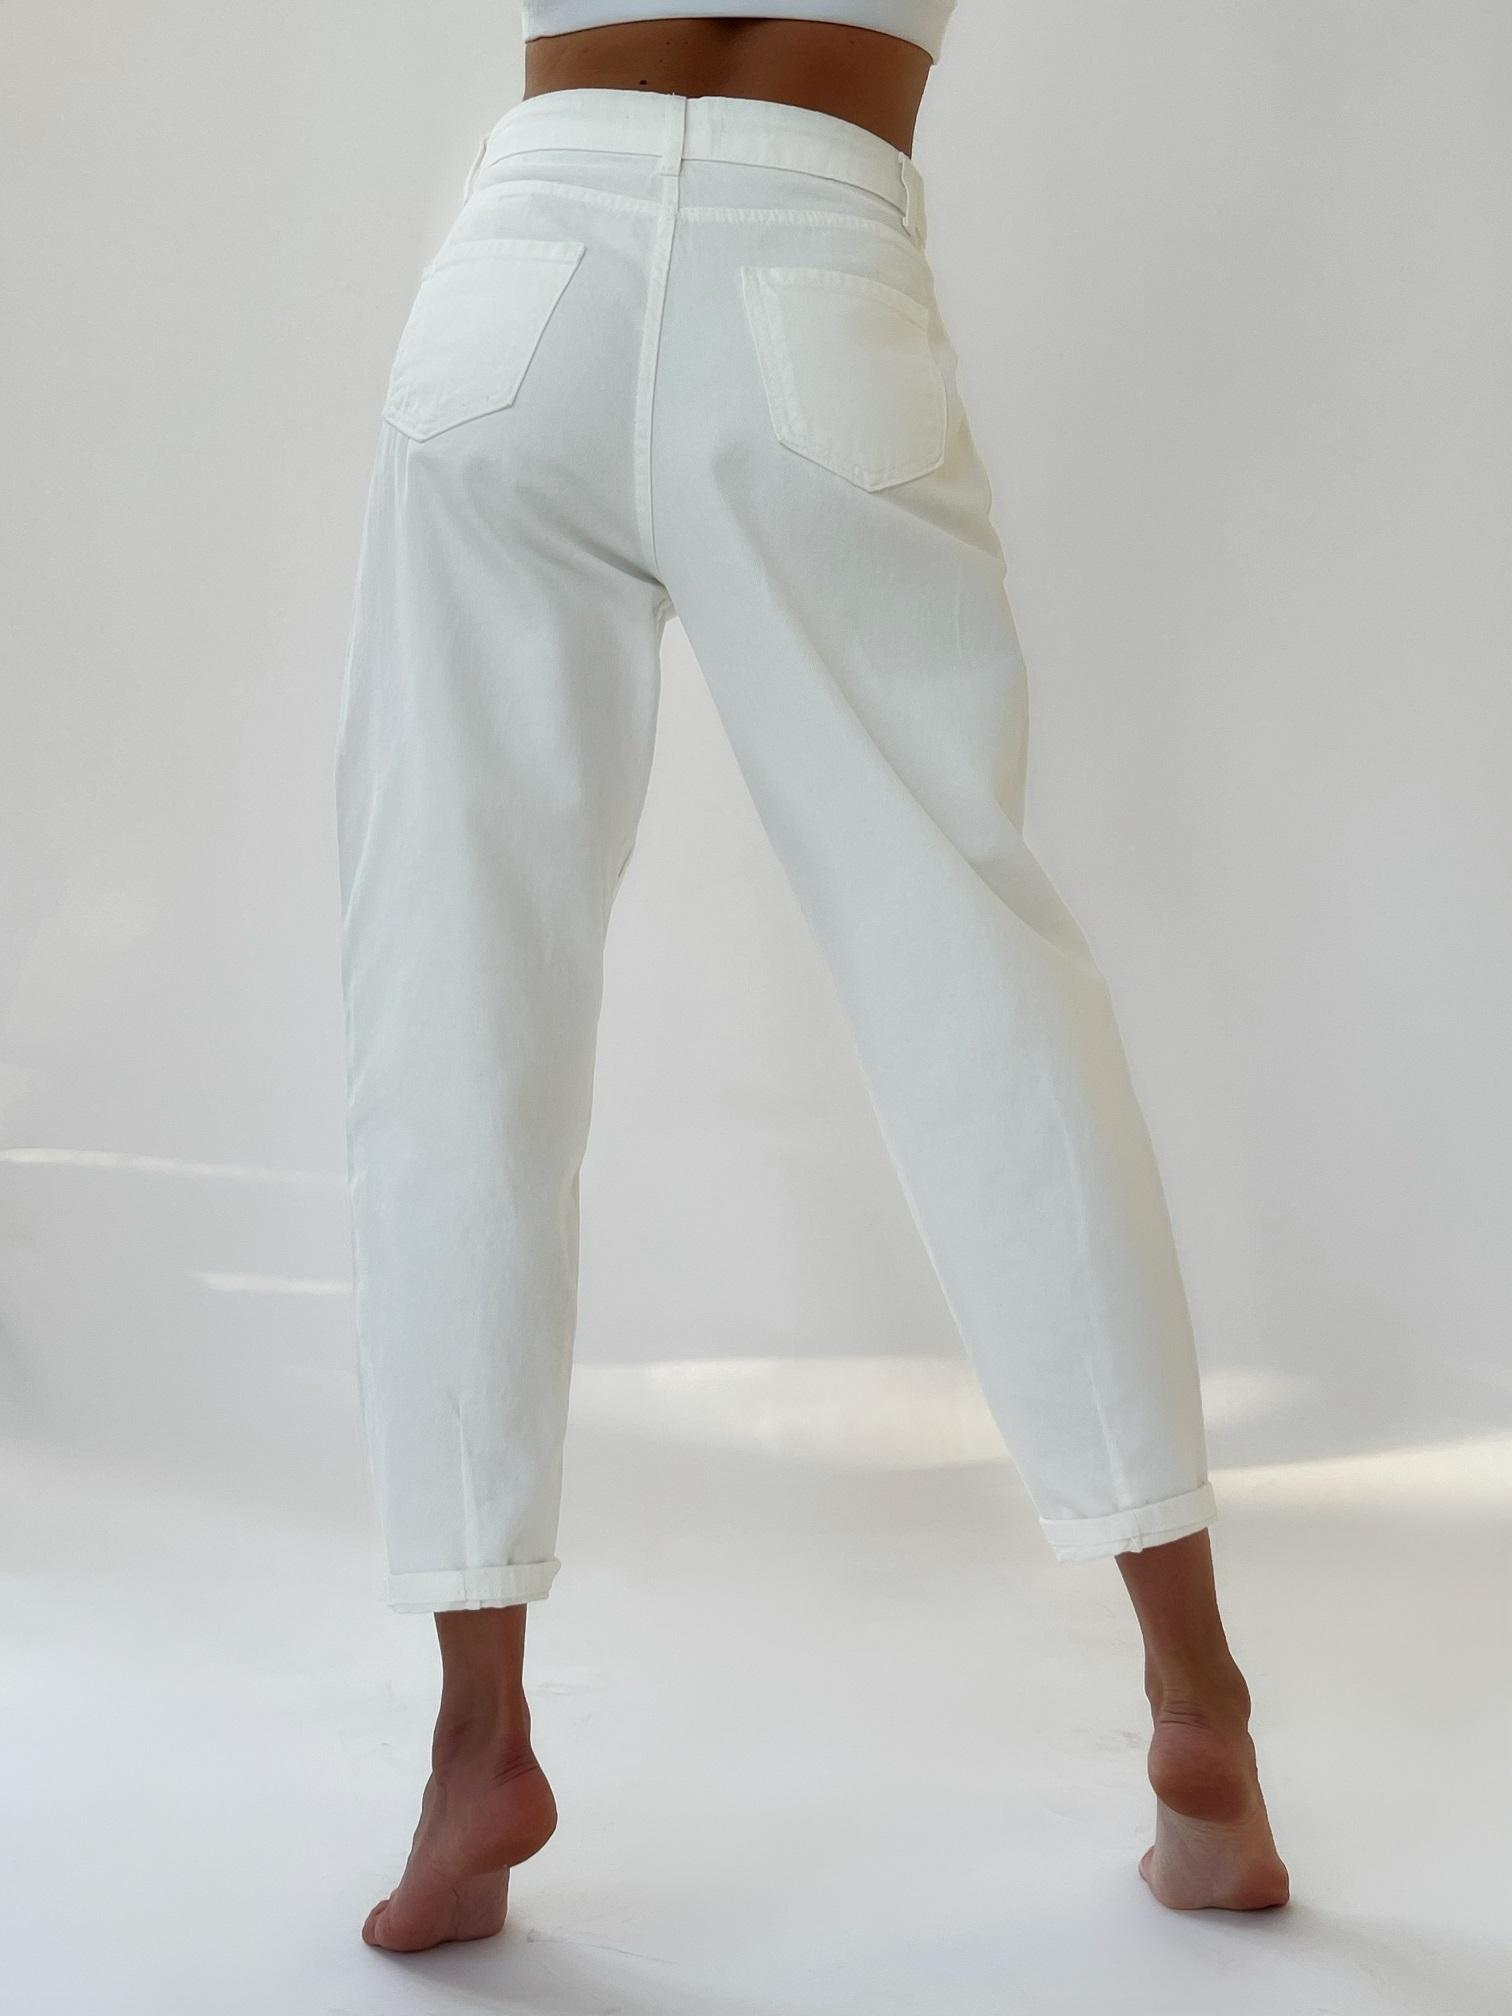 Джинсы, Miss Form, 1043 (белый)